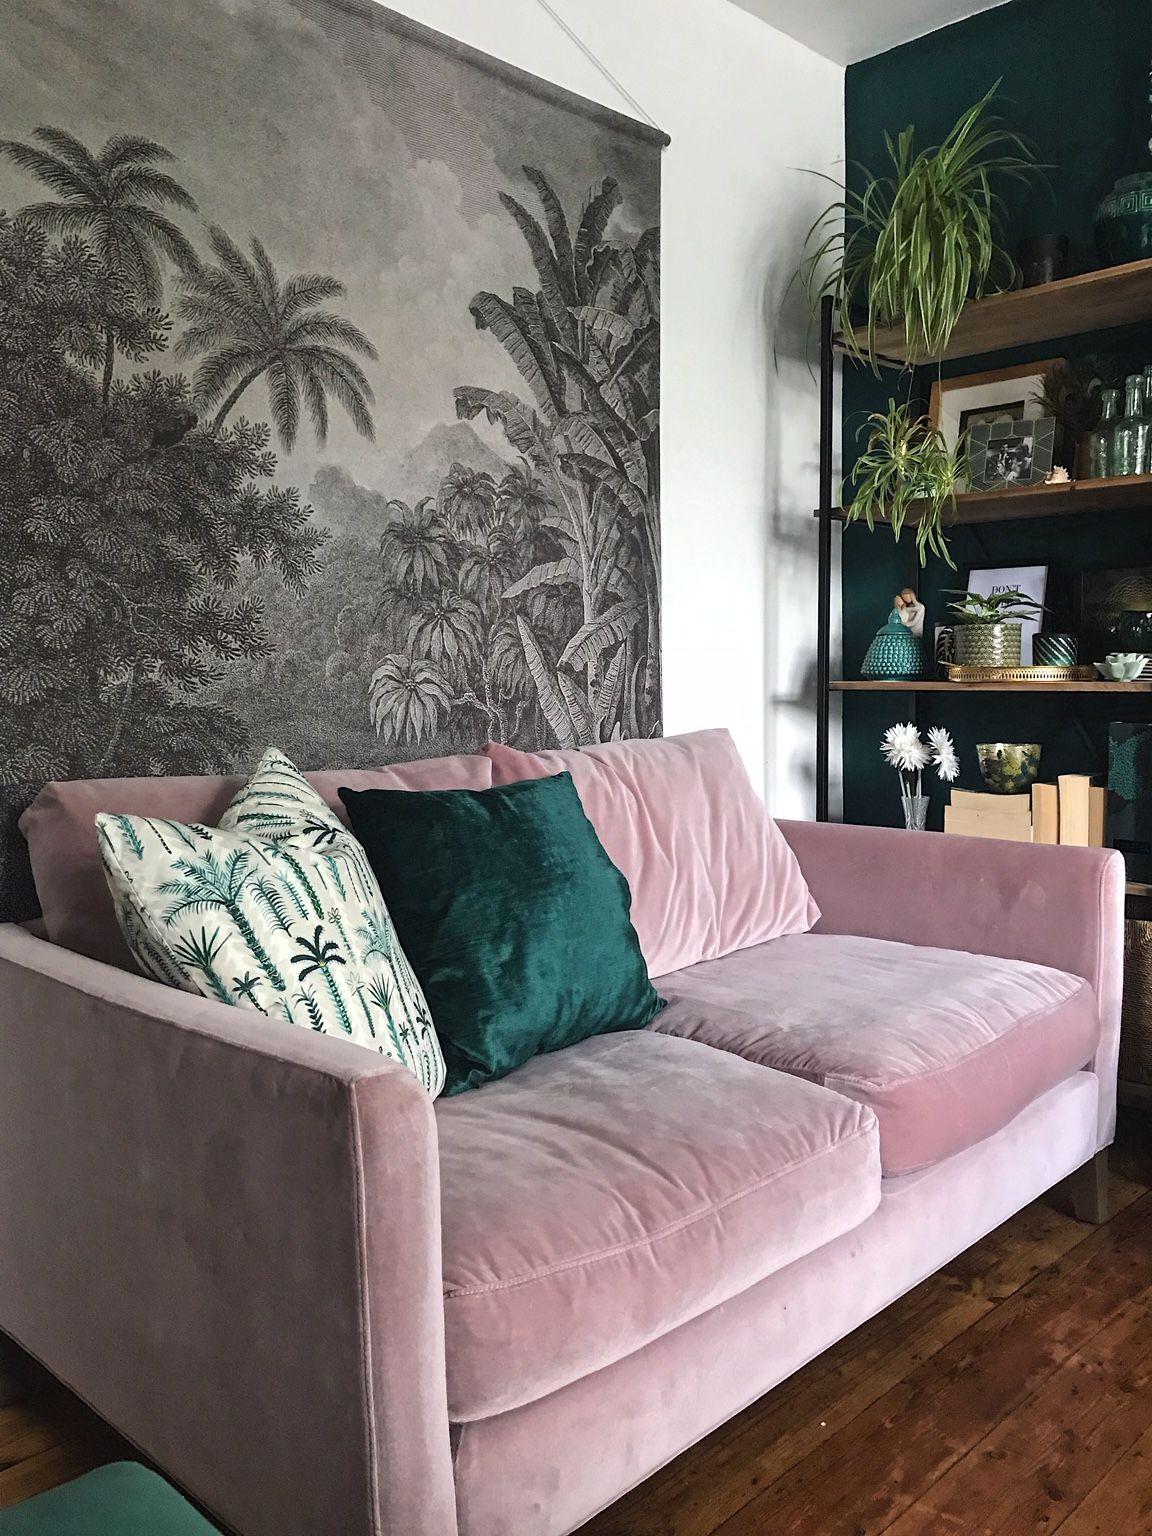 My Sofa.com style is... Choosing a New Sofa With Sofa.com ...